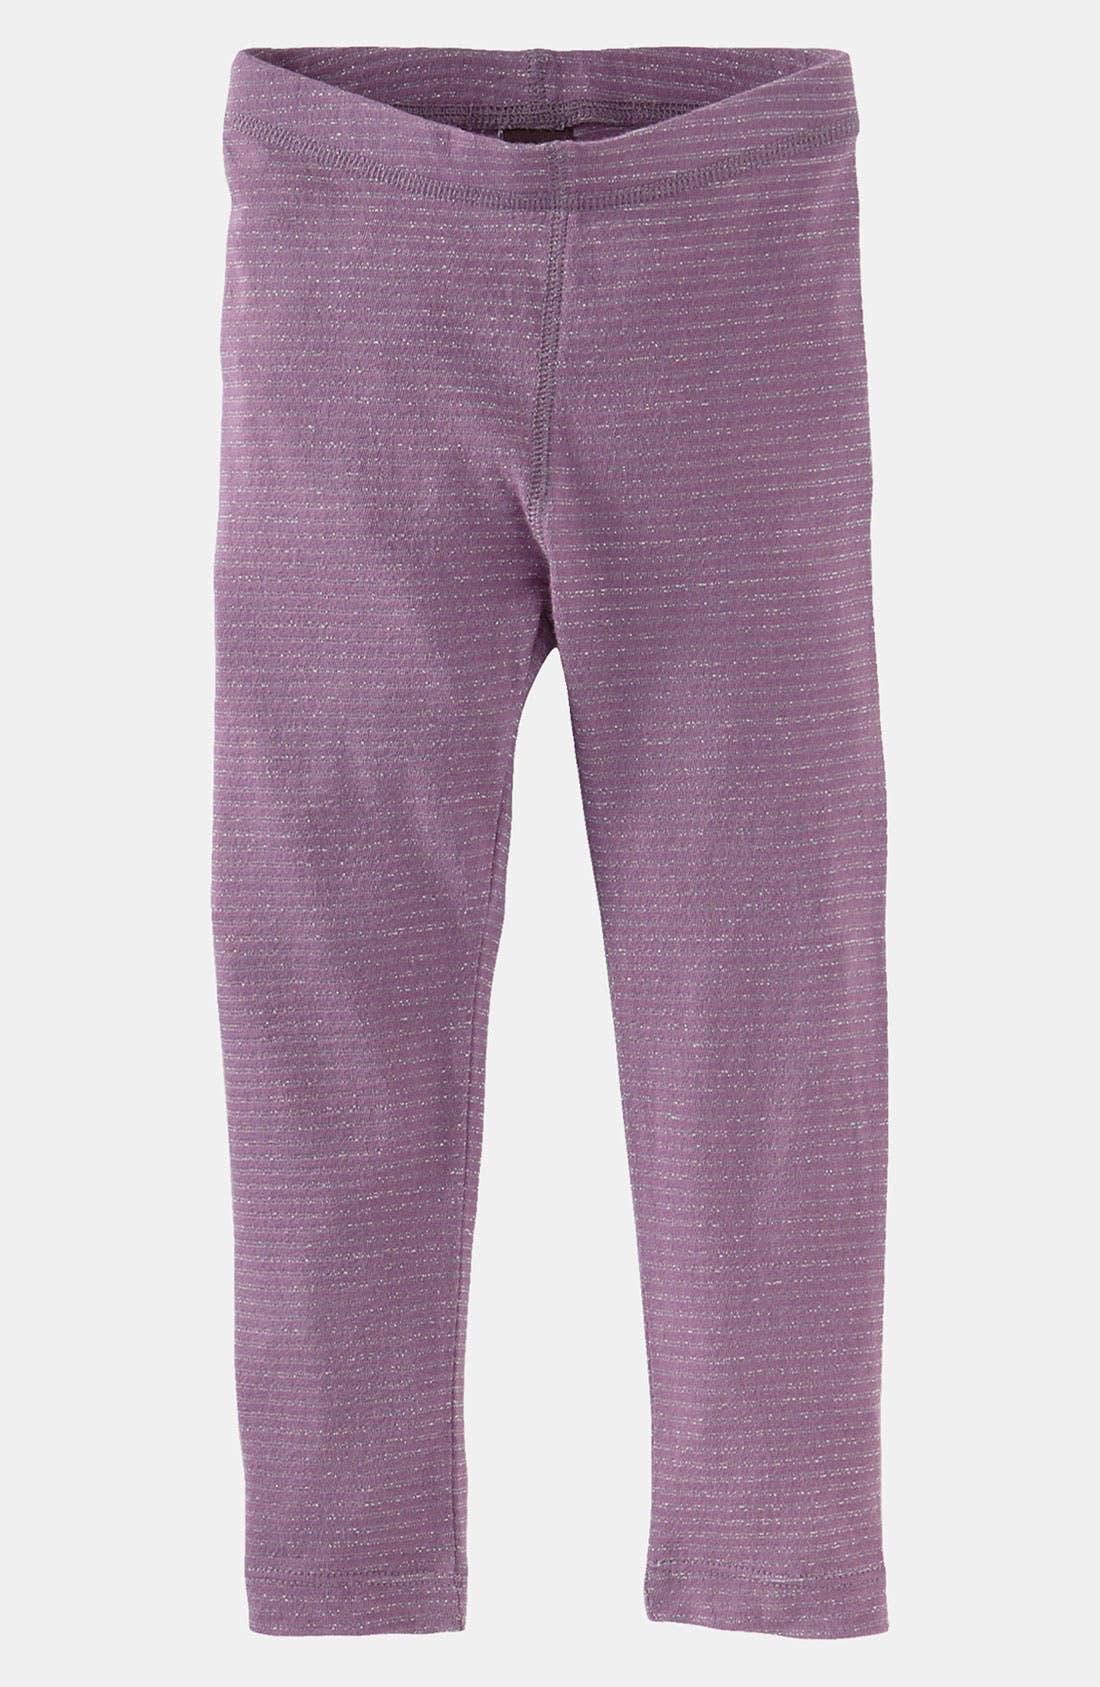 Main Image - Tea Collection 'Sparkle Stripe' Leggings (Infant)